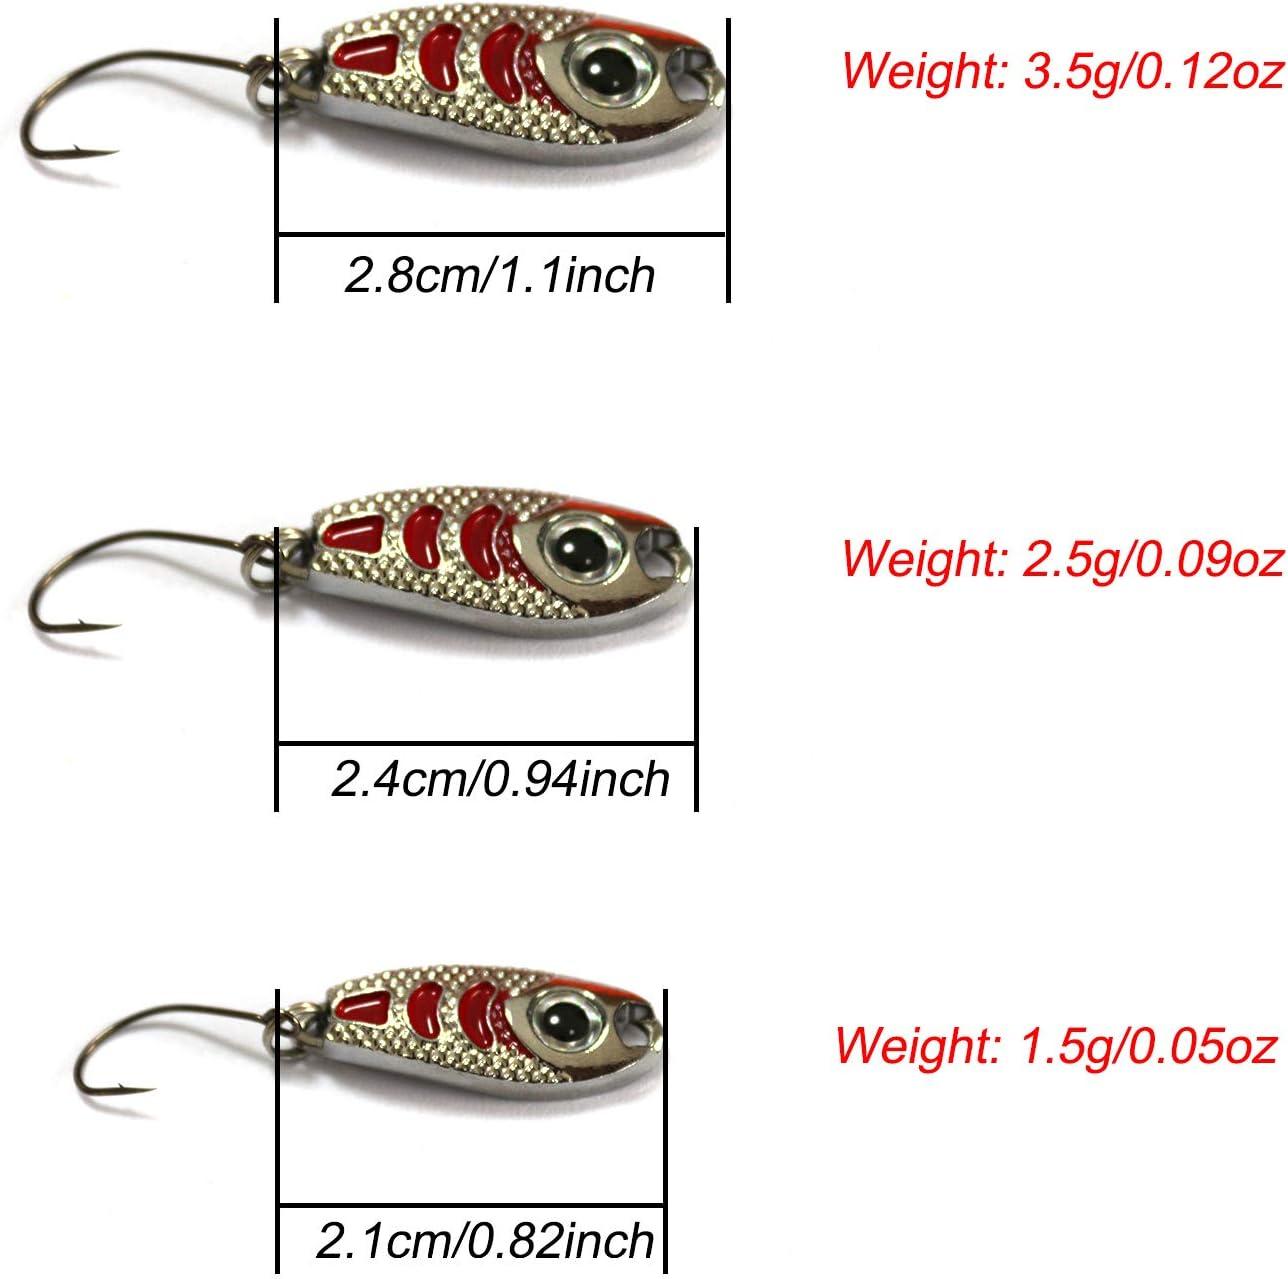 Fishing Spoon Trout Kit 10 PCS Kit Cucchiaini per Trota Esche da Pesca Artificiali Esche Artificiali Spinning Trota FitTrek Cucchiaini Pesca Spinning Trota